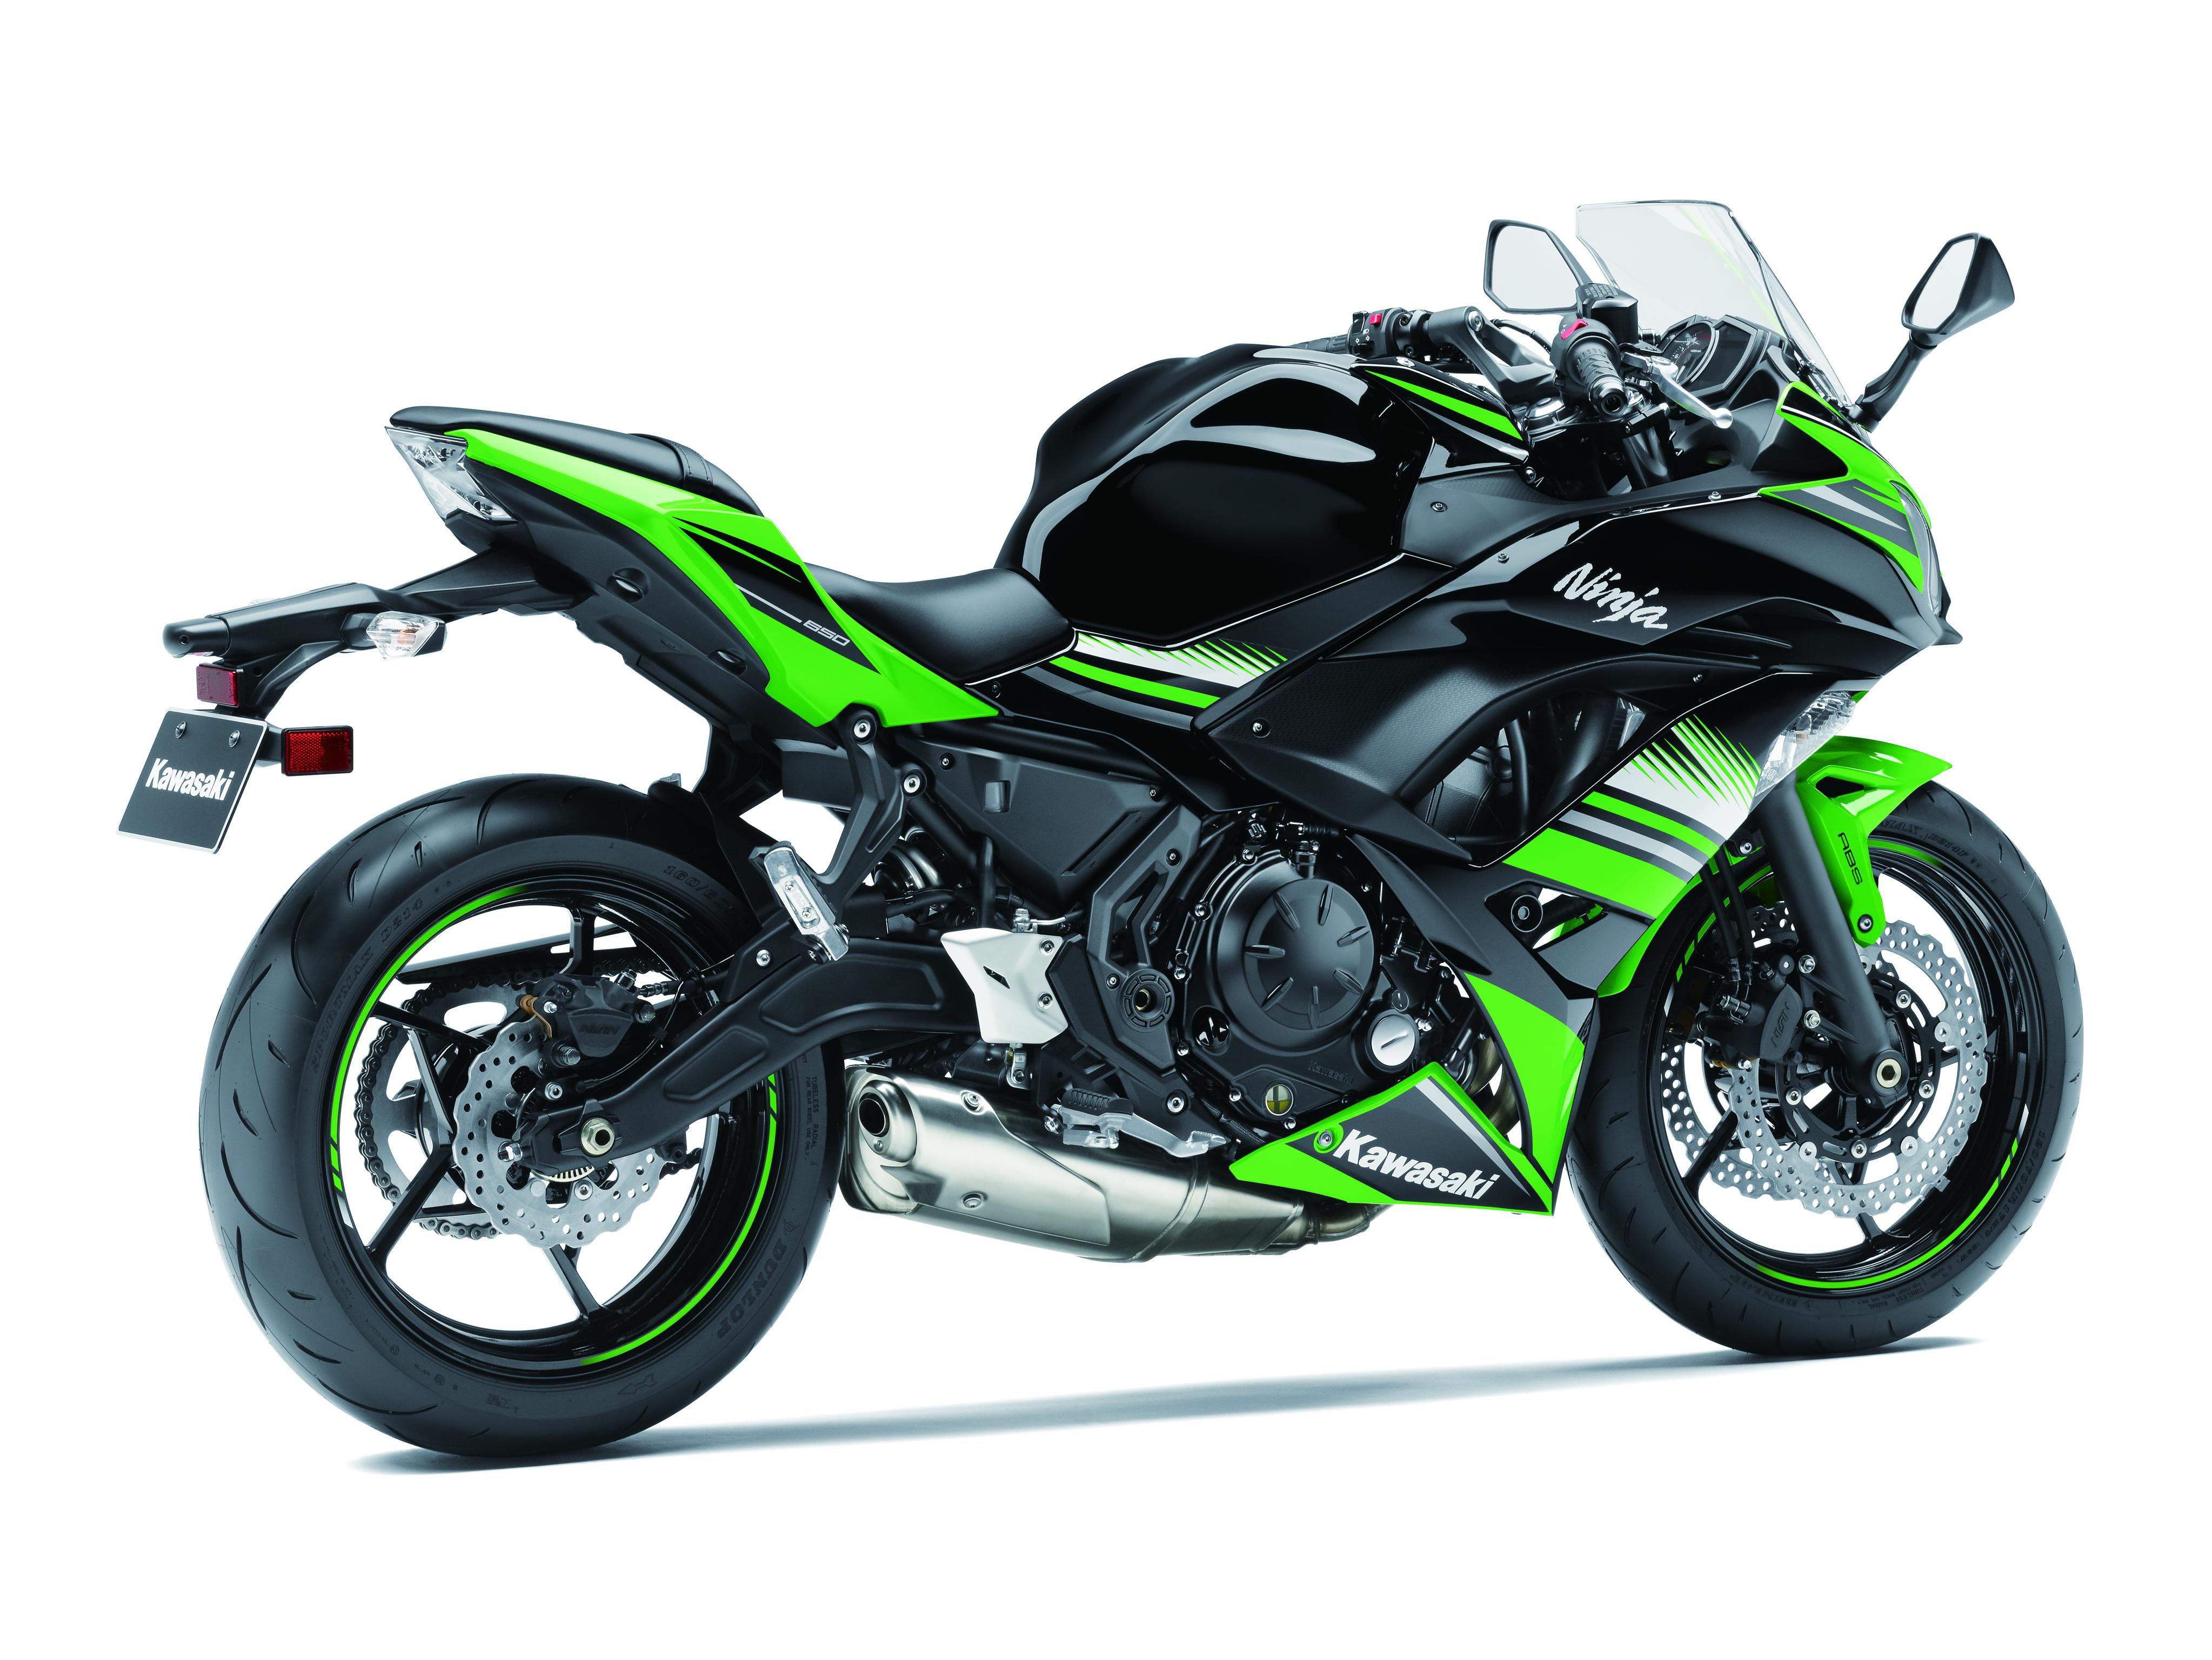 Kawasaki reveals Ninja 650 | Visordown